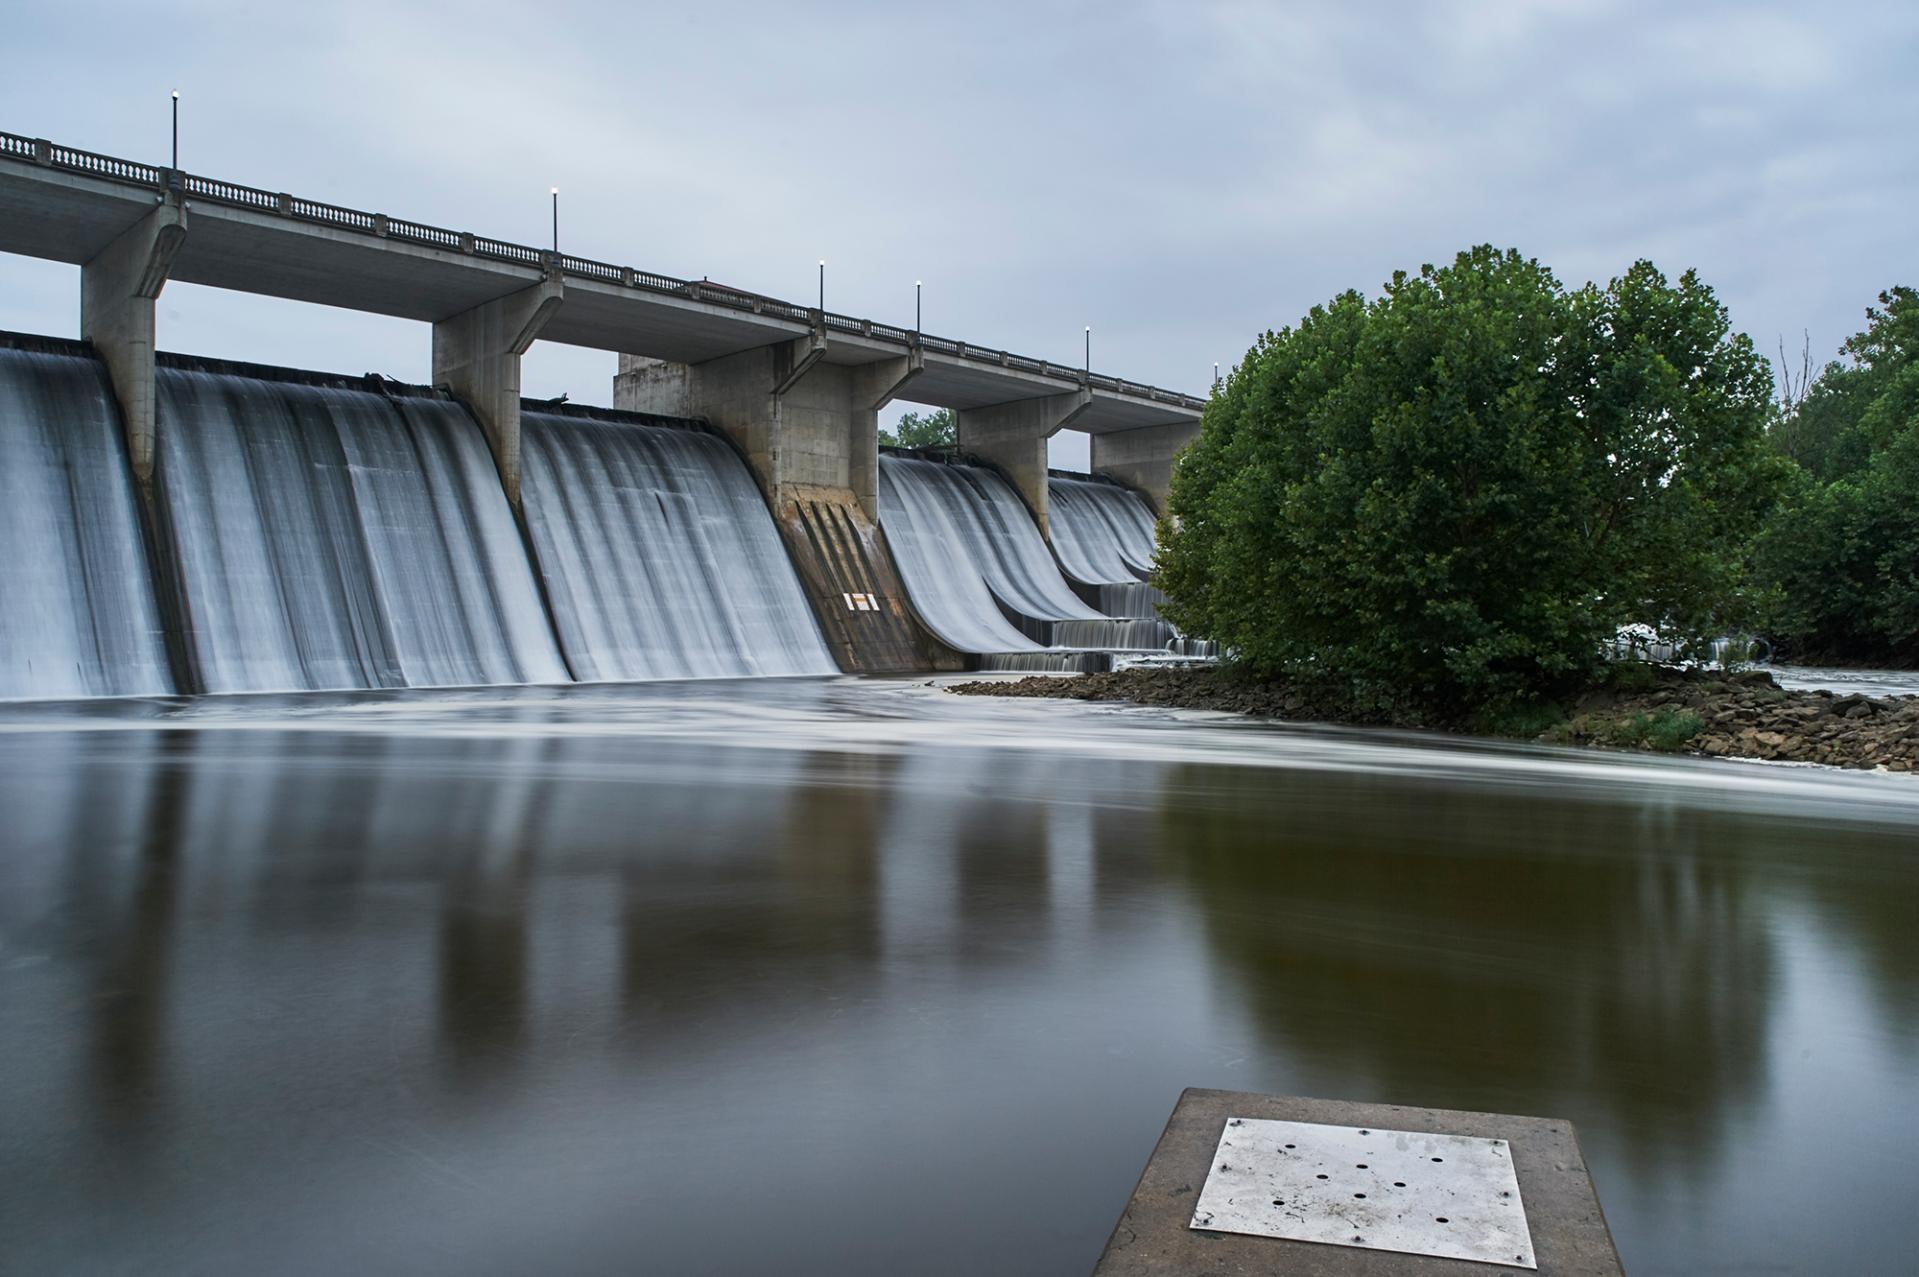 Tamron-24-70-G2-Review-Scioto-River-Dam.jpg